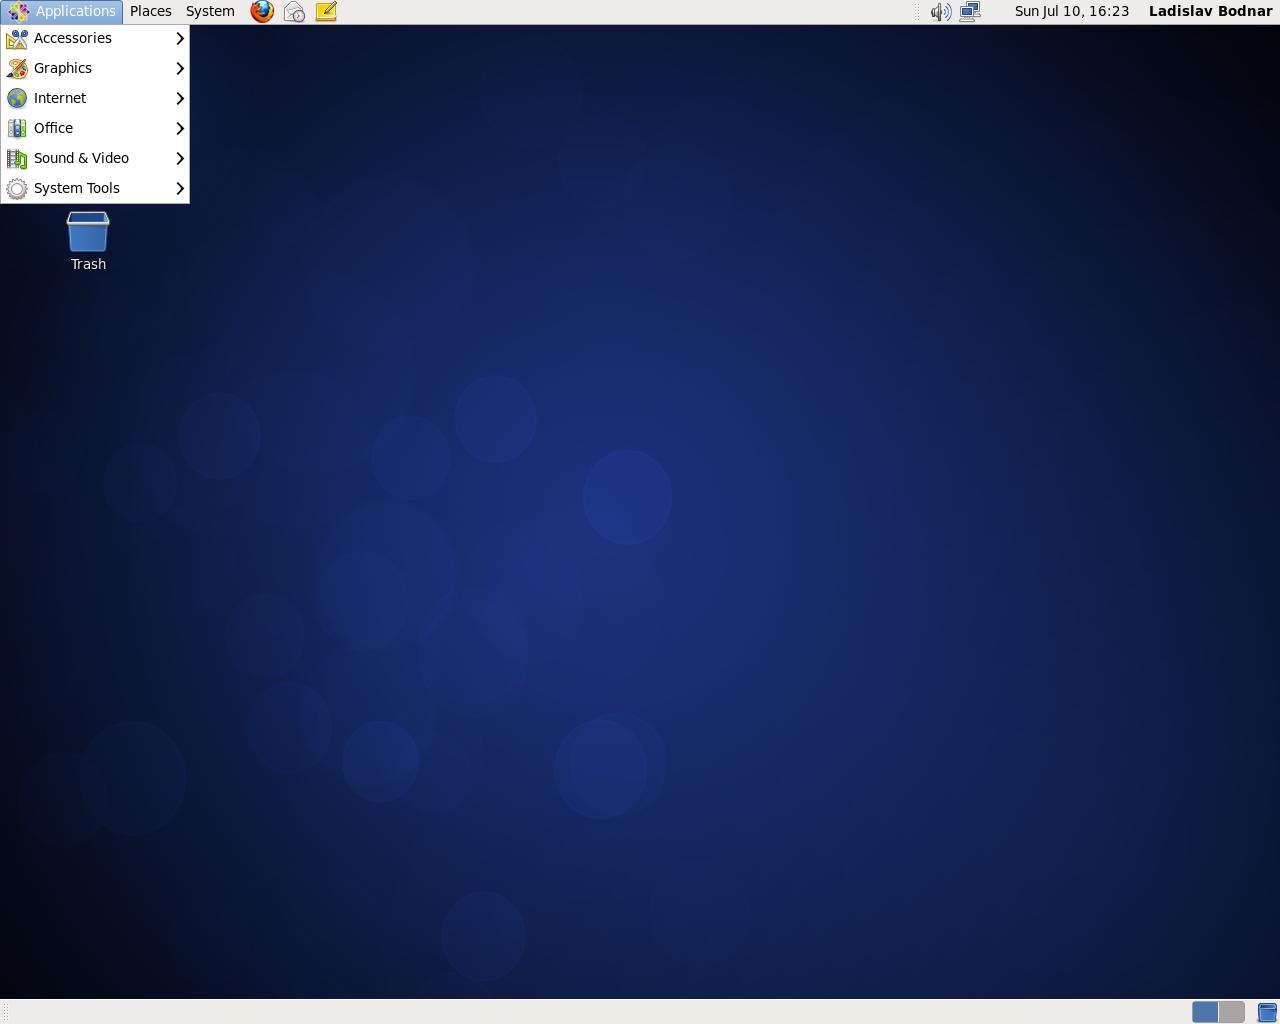 free download centos 6.4 iso 32 bit